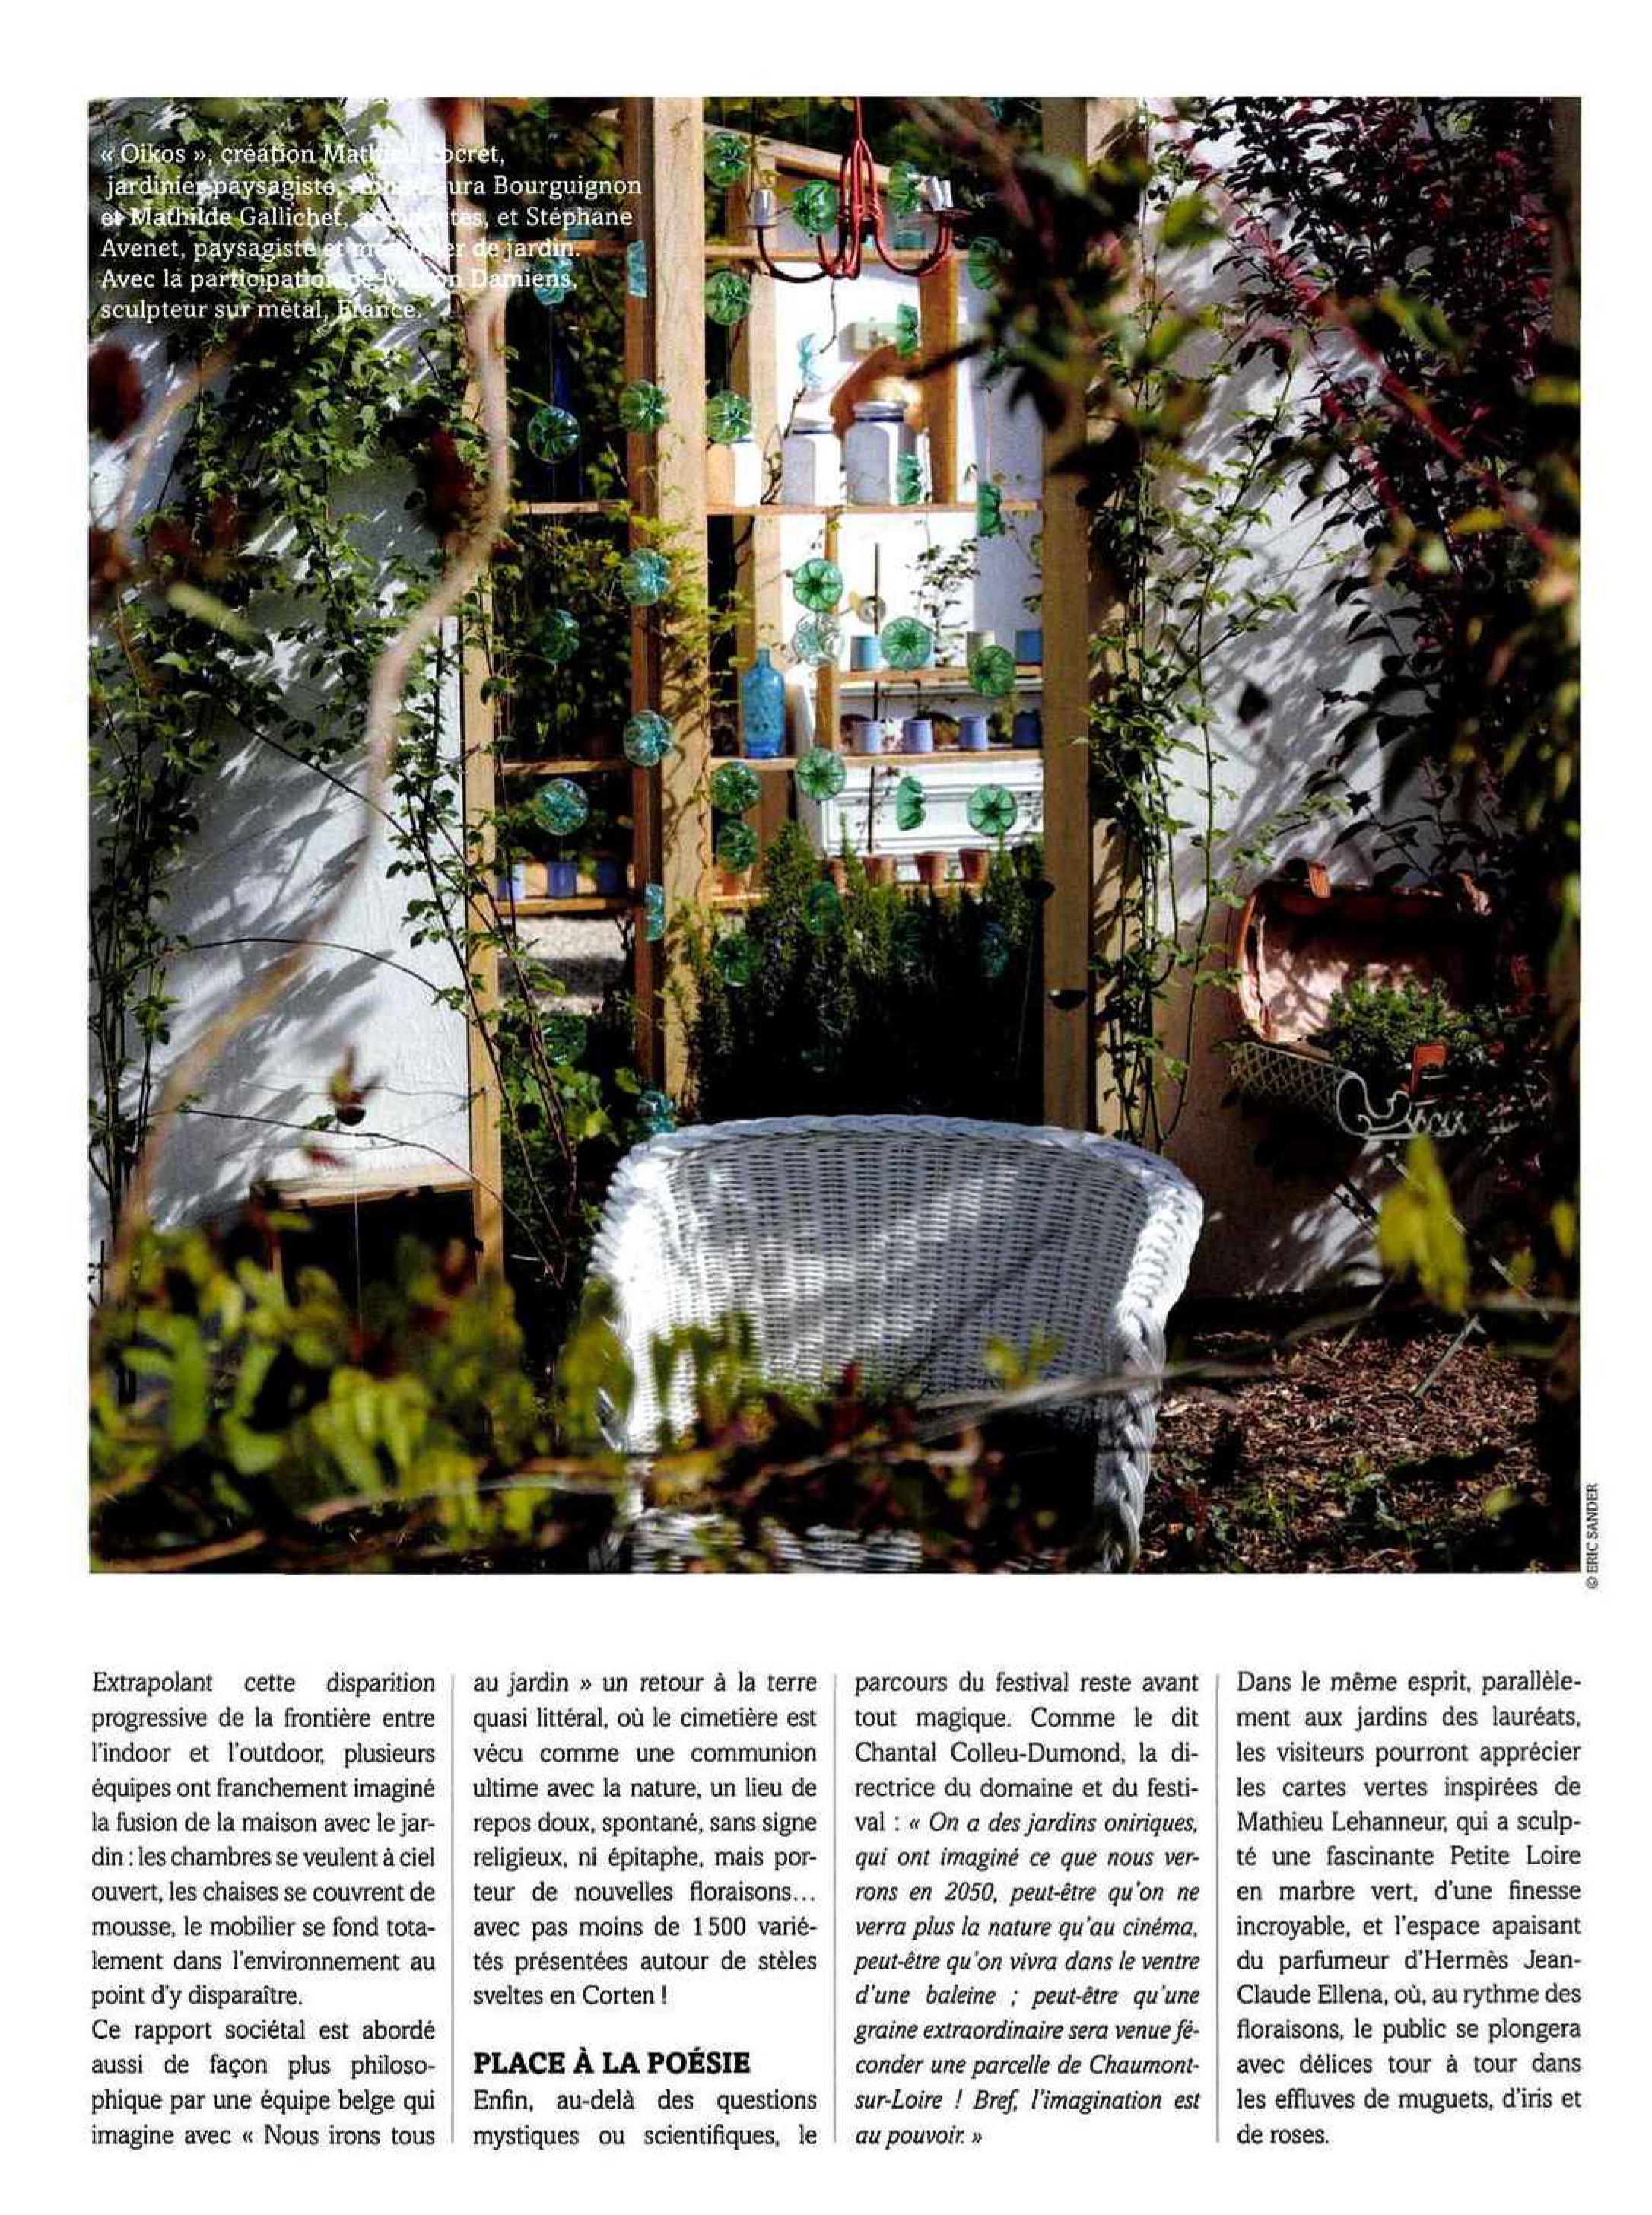 ExterieurDesignMagazine-30062016-3-Simonson-Landscape.jpg